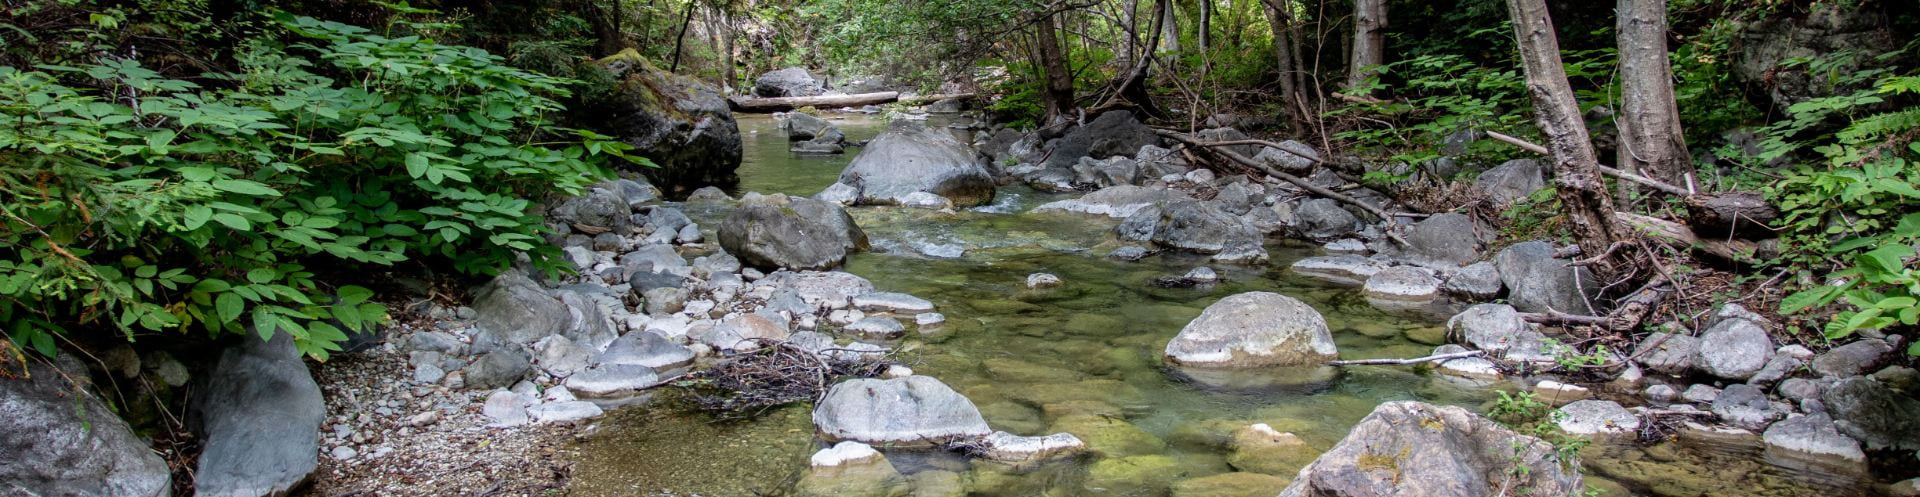 Big Creek Steelhead Ecology